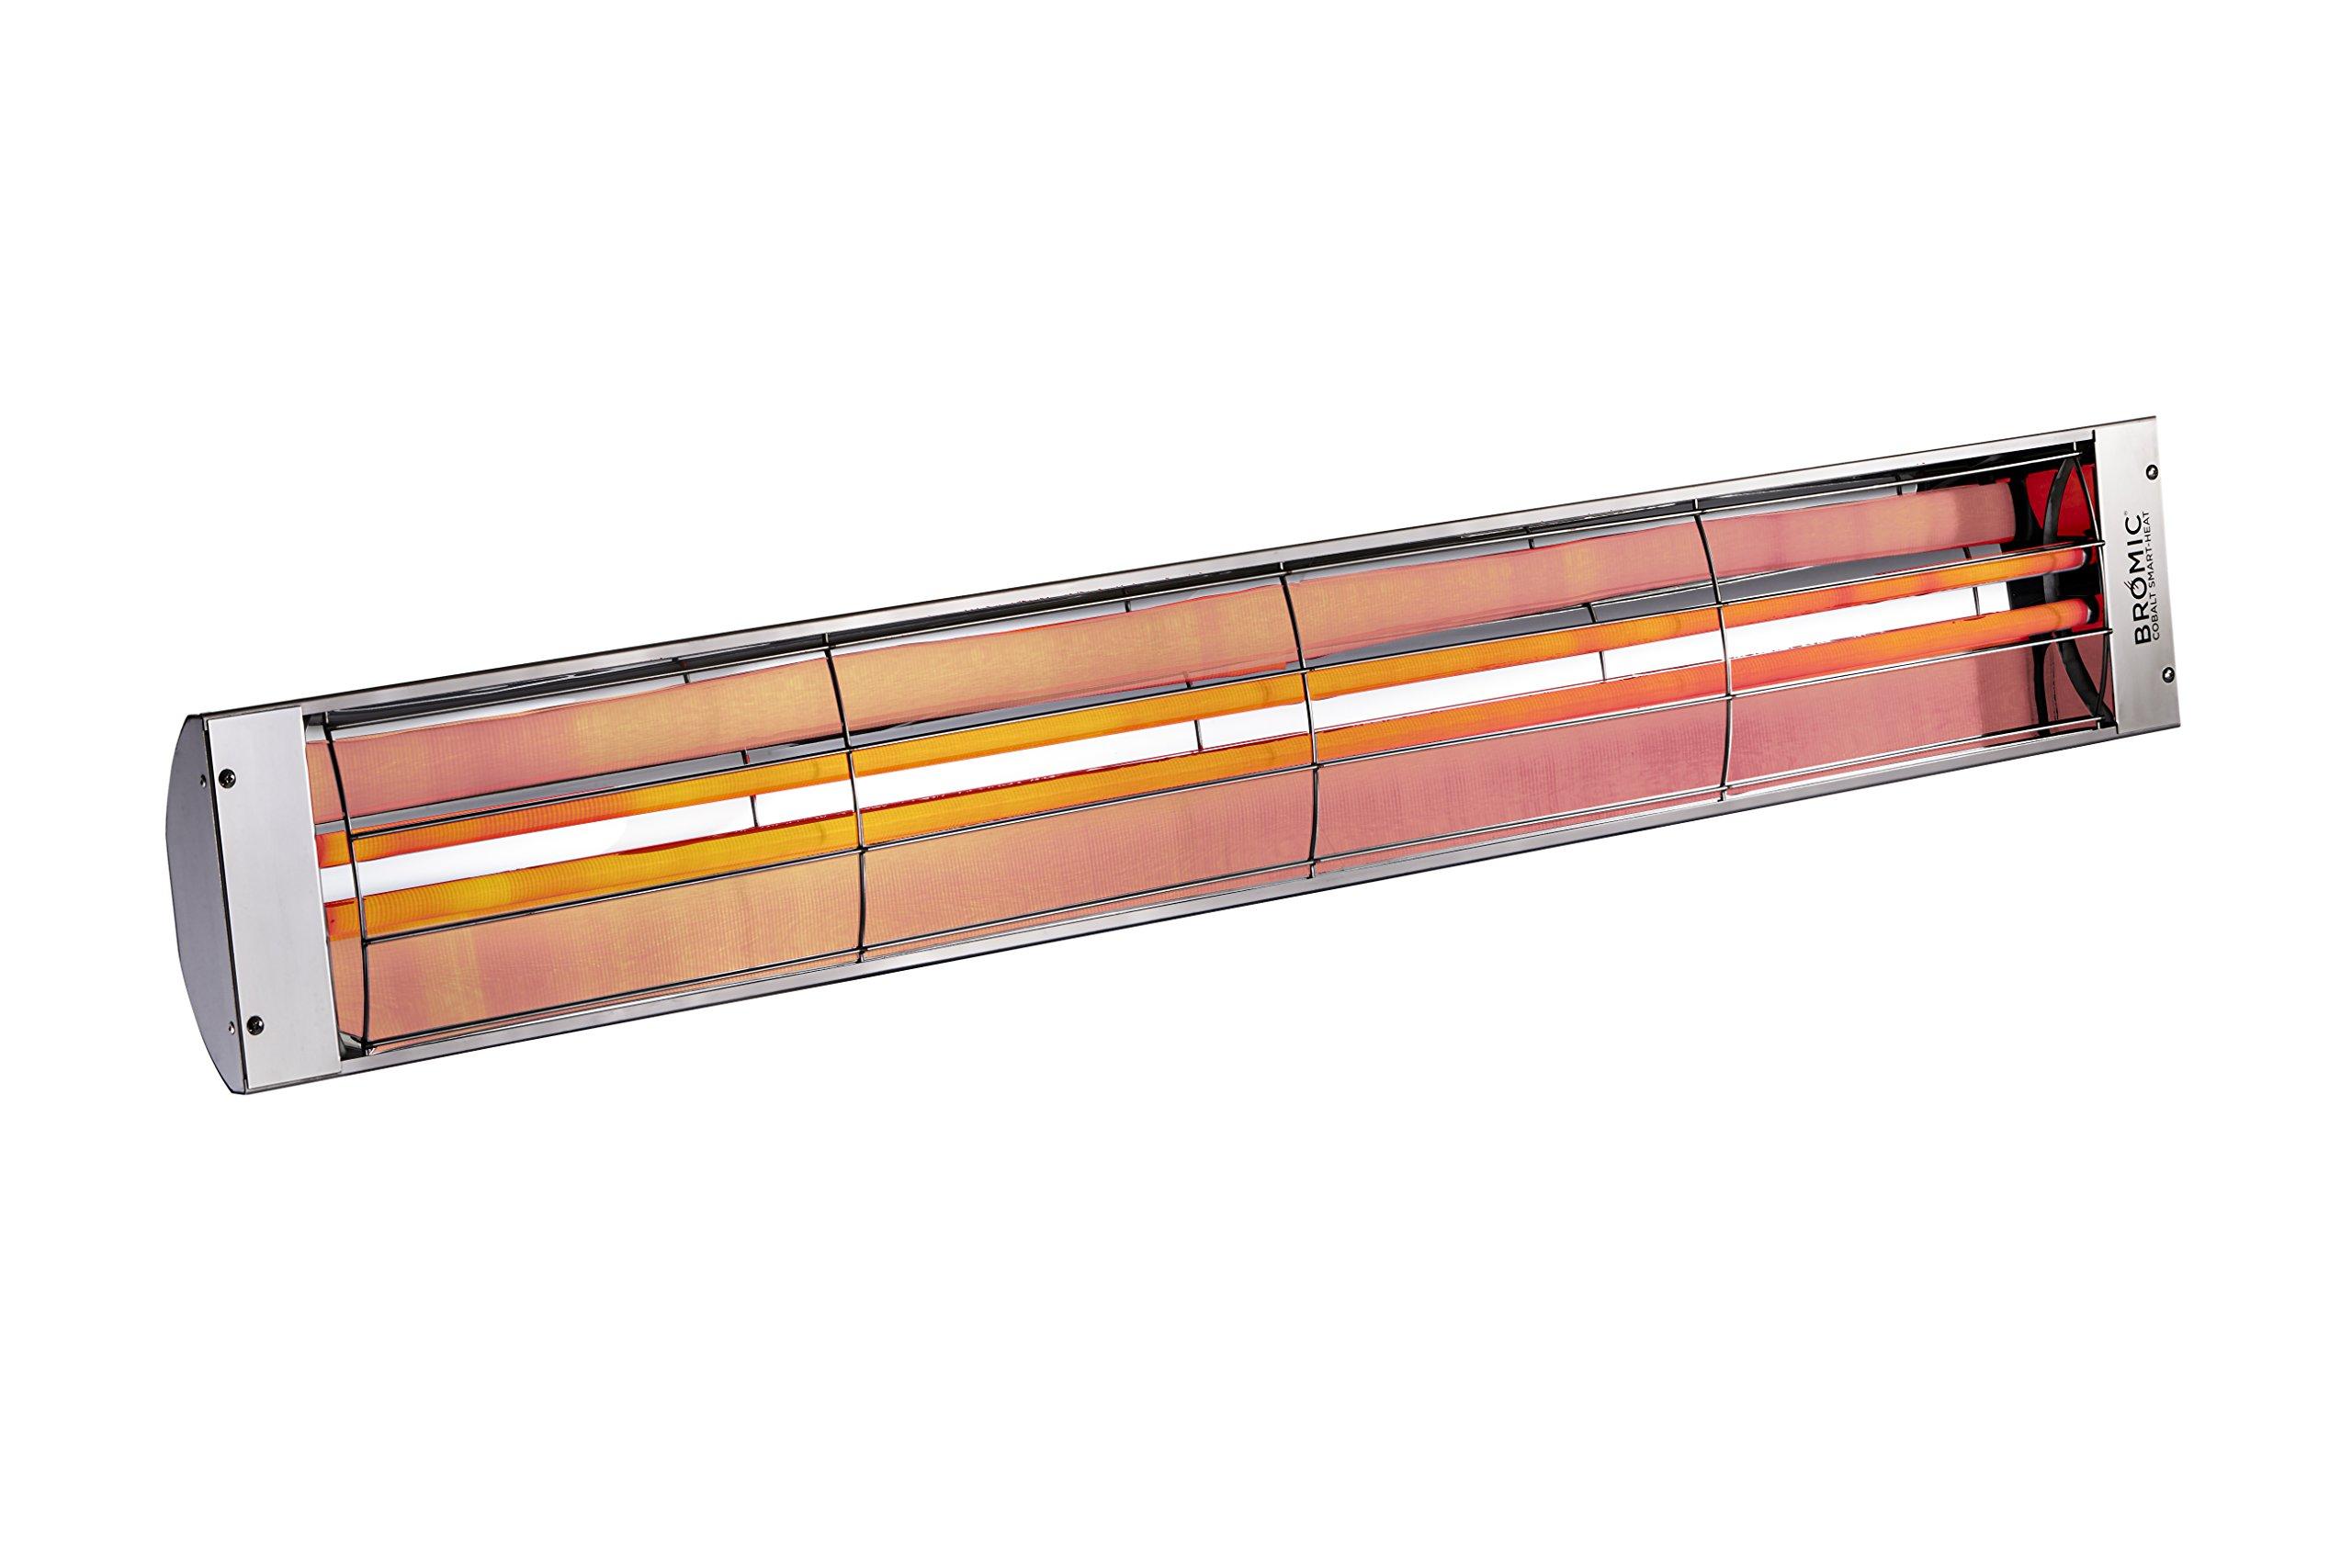 Bromic Heating BR-ECB40 220-240V 4000W Stainless Steel